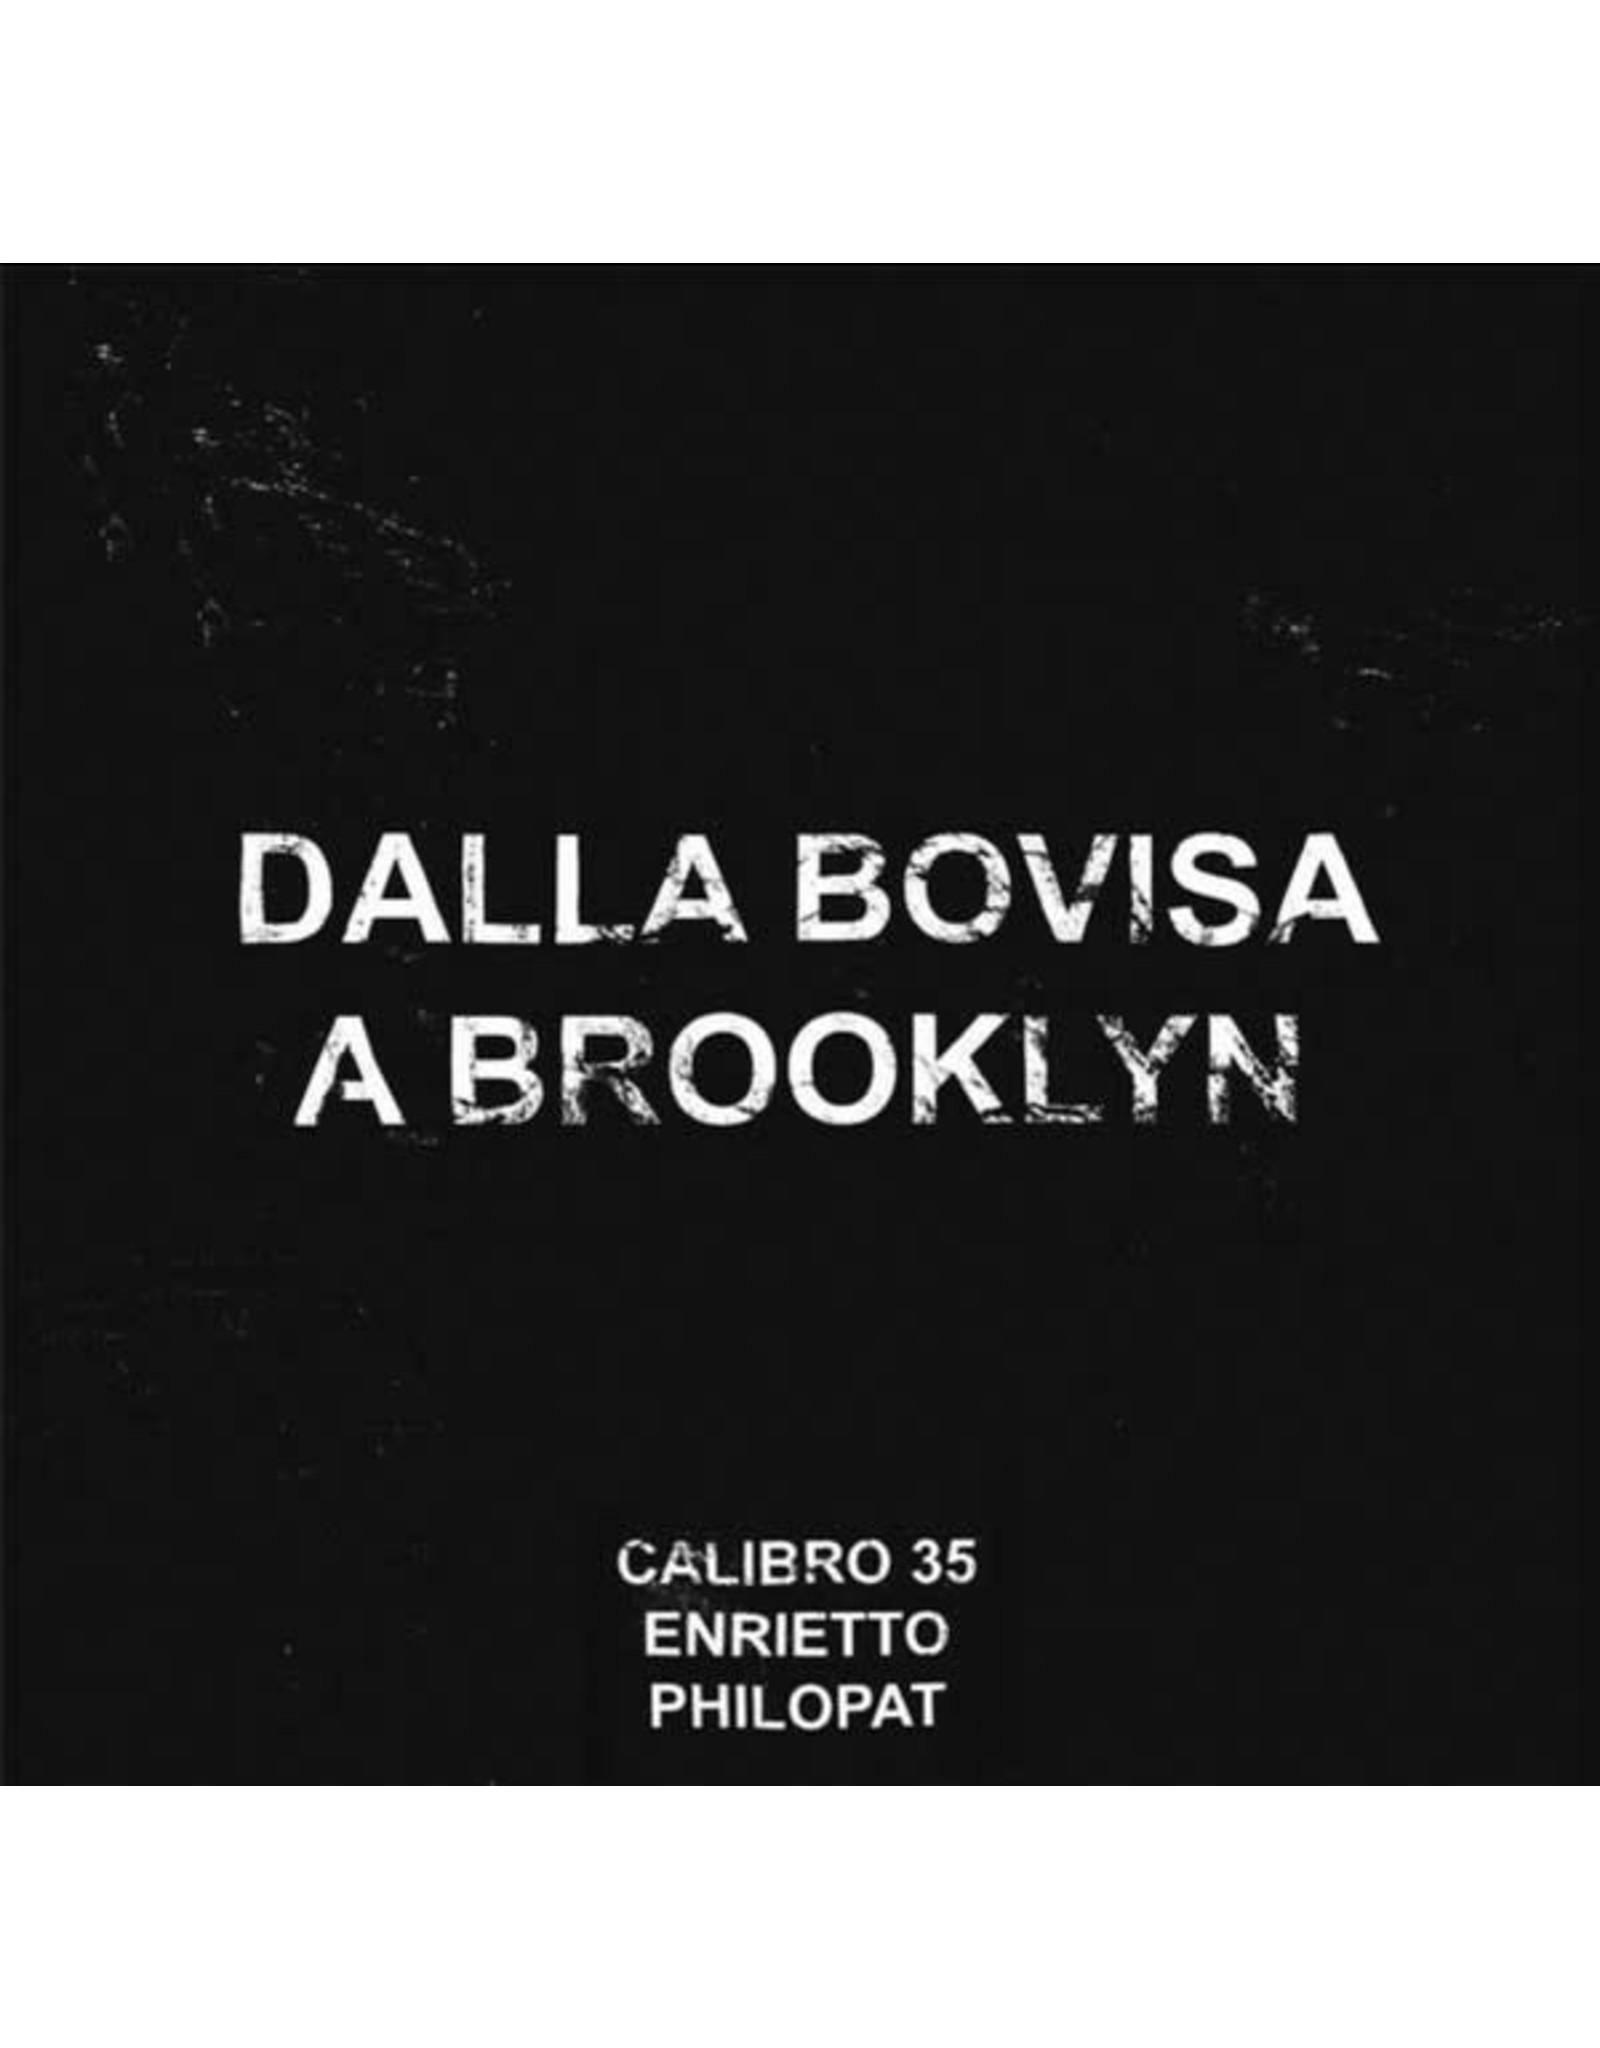 "New Vinyl Calibro 35 - Dalla Bovisa A Brooklyn 12"" EP + Comic Book)"